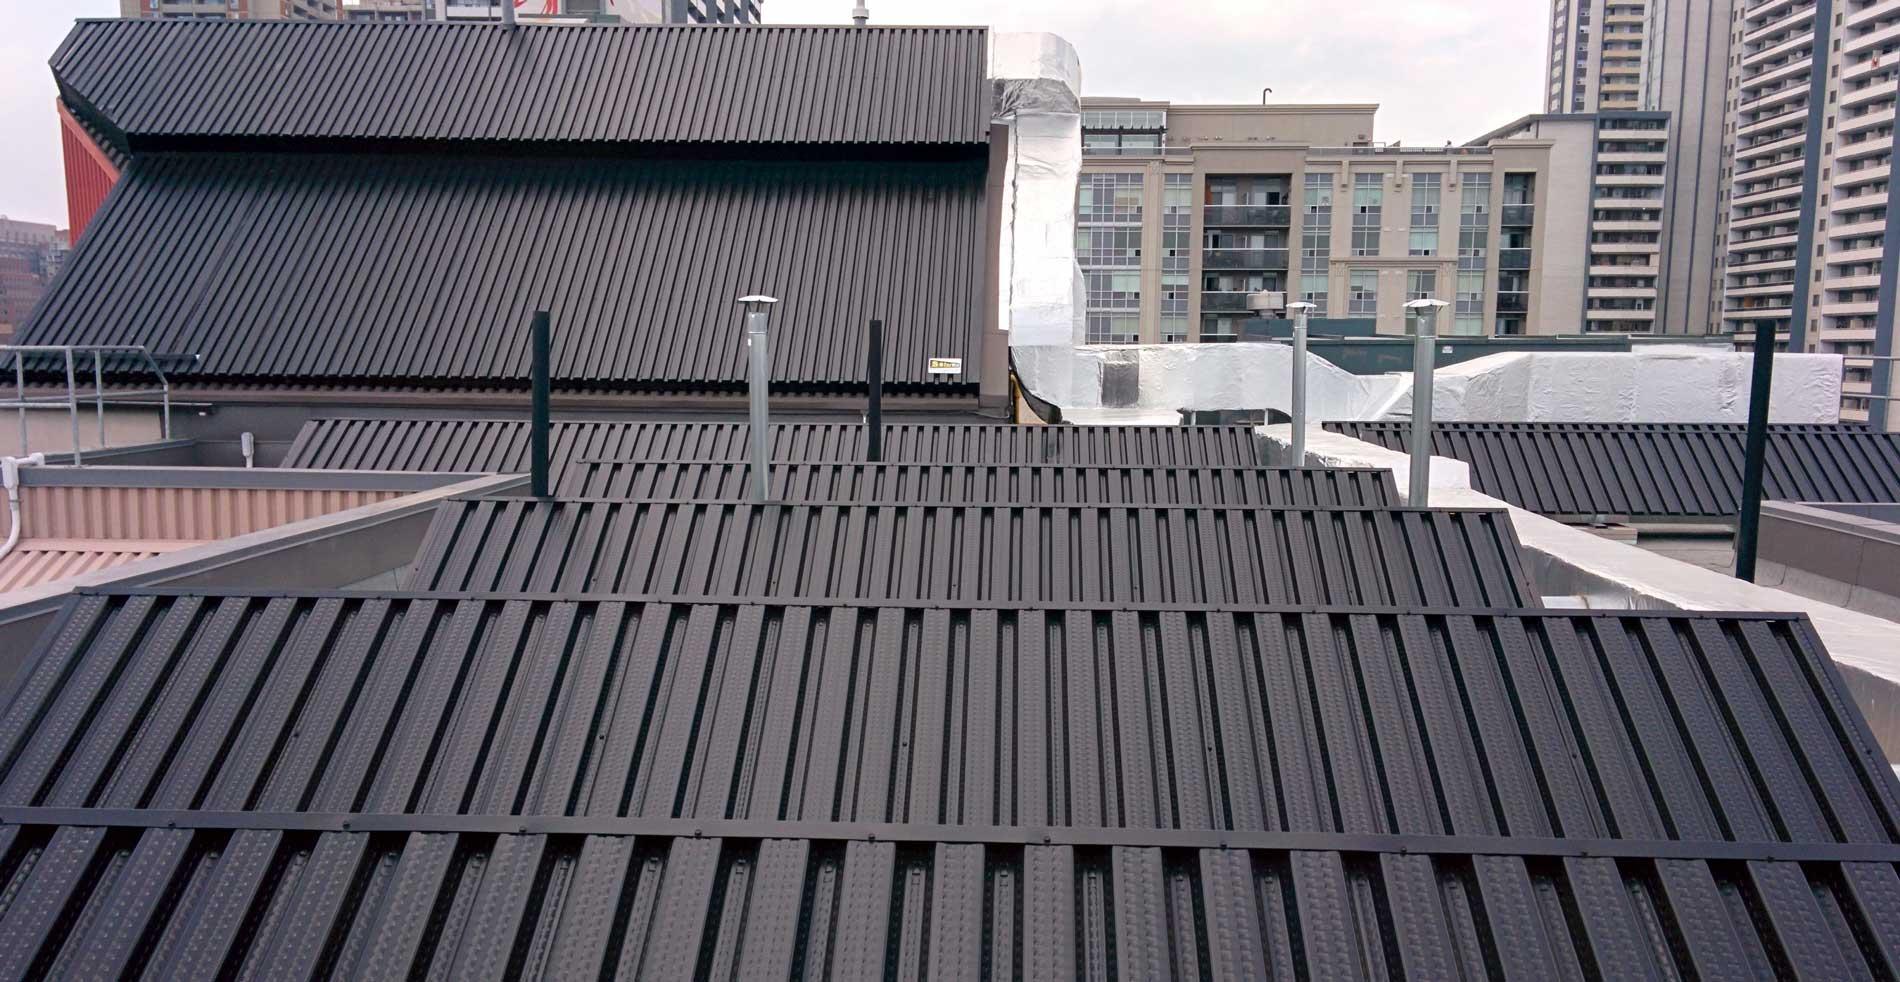 Hugh-Garner-SolarWall-Rooftop